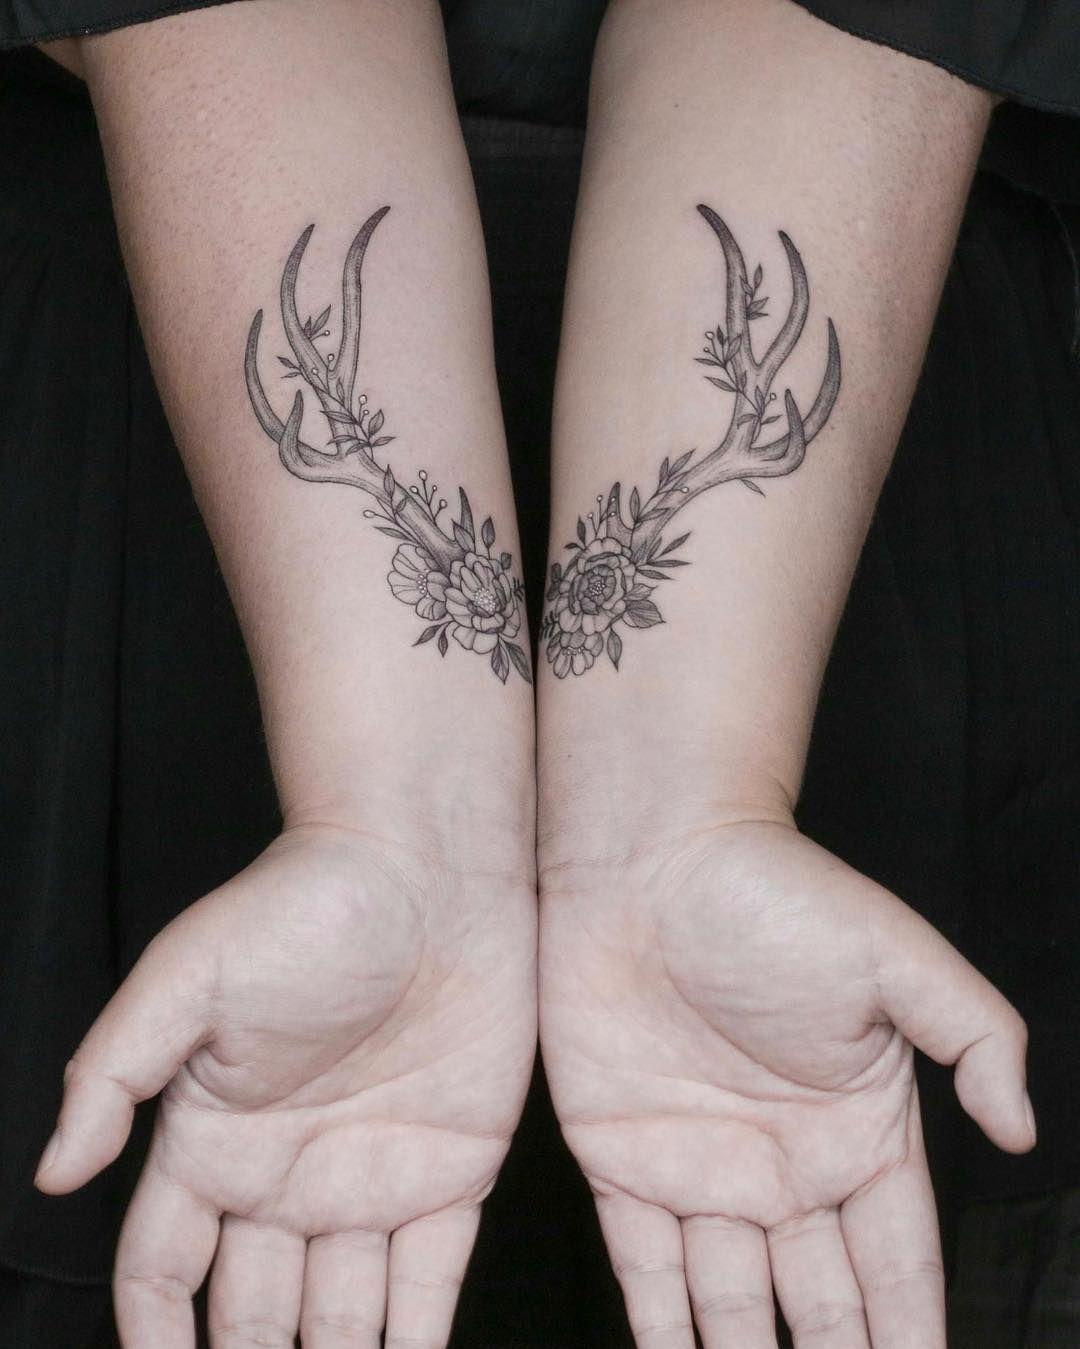 Floral Antler Tattoo: Tattoos Antlers #antlers #fineline #floral #flowertattoo